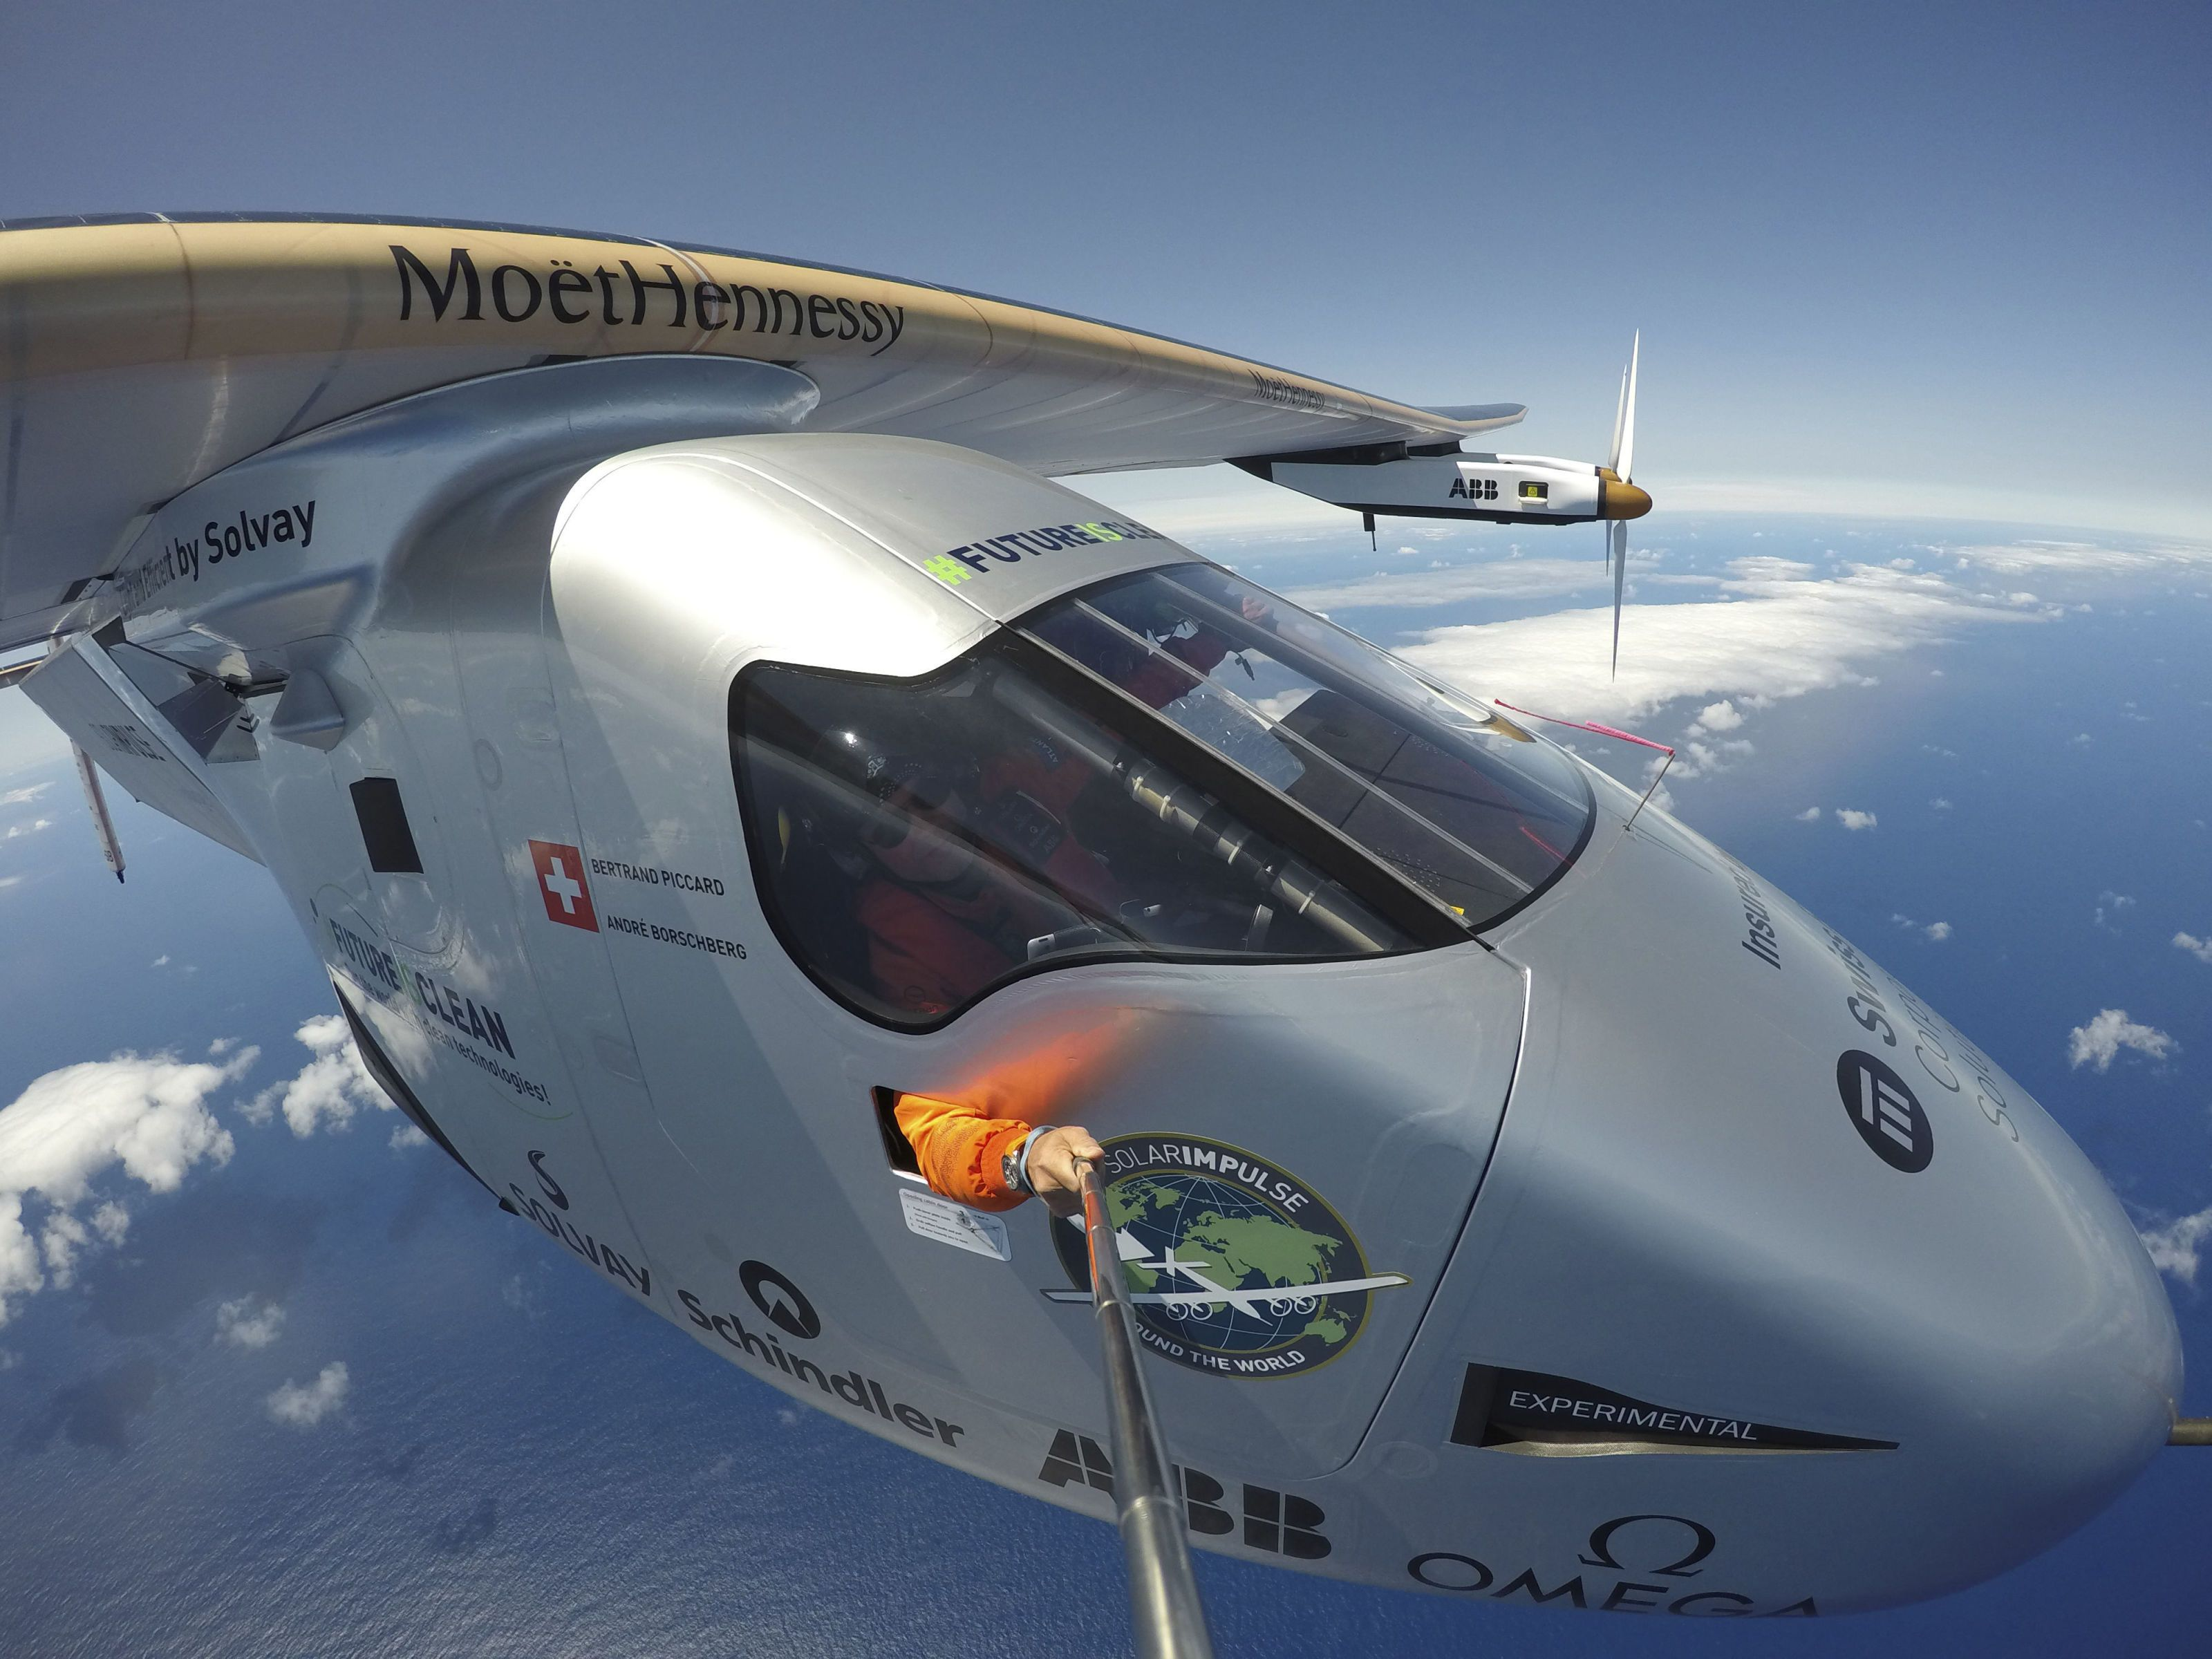 The Solar Plane Just Crossed the Atlantic Ocean